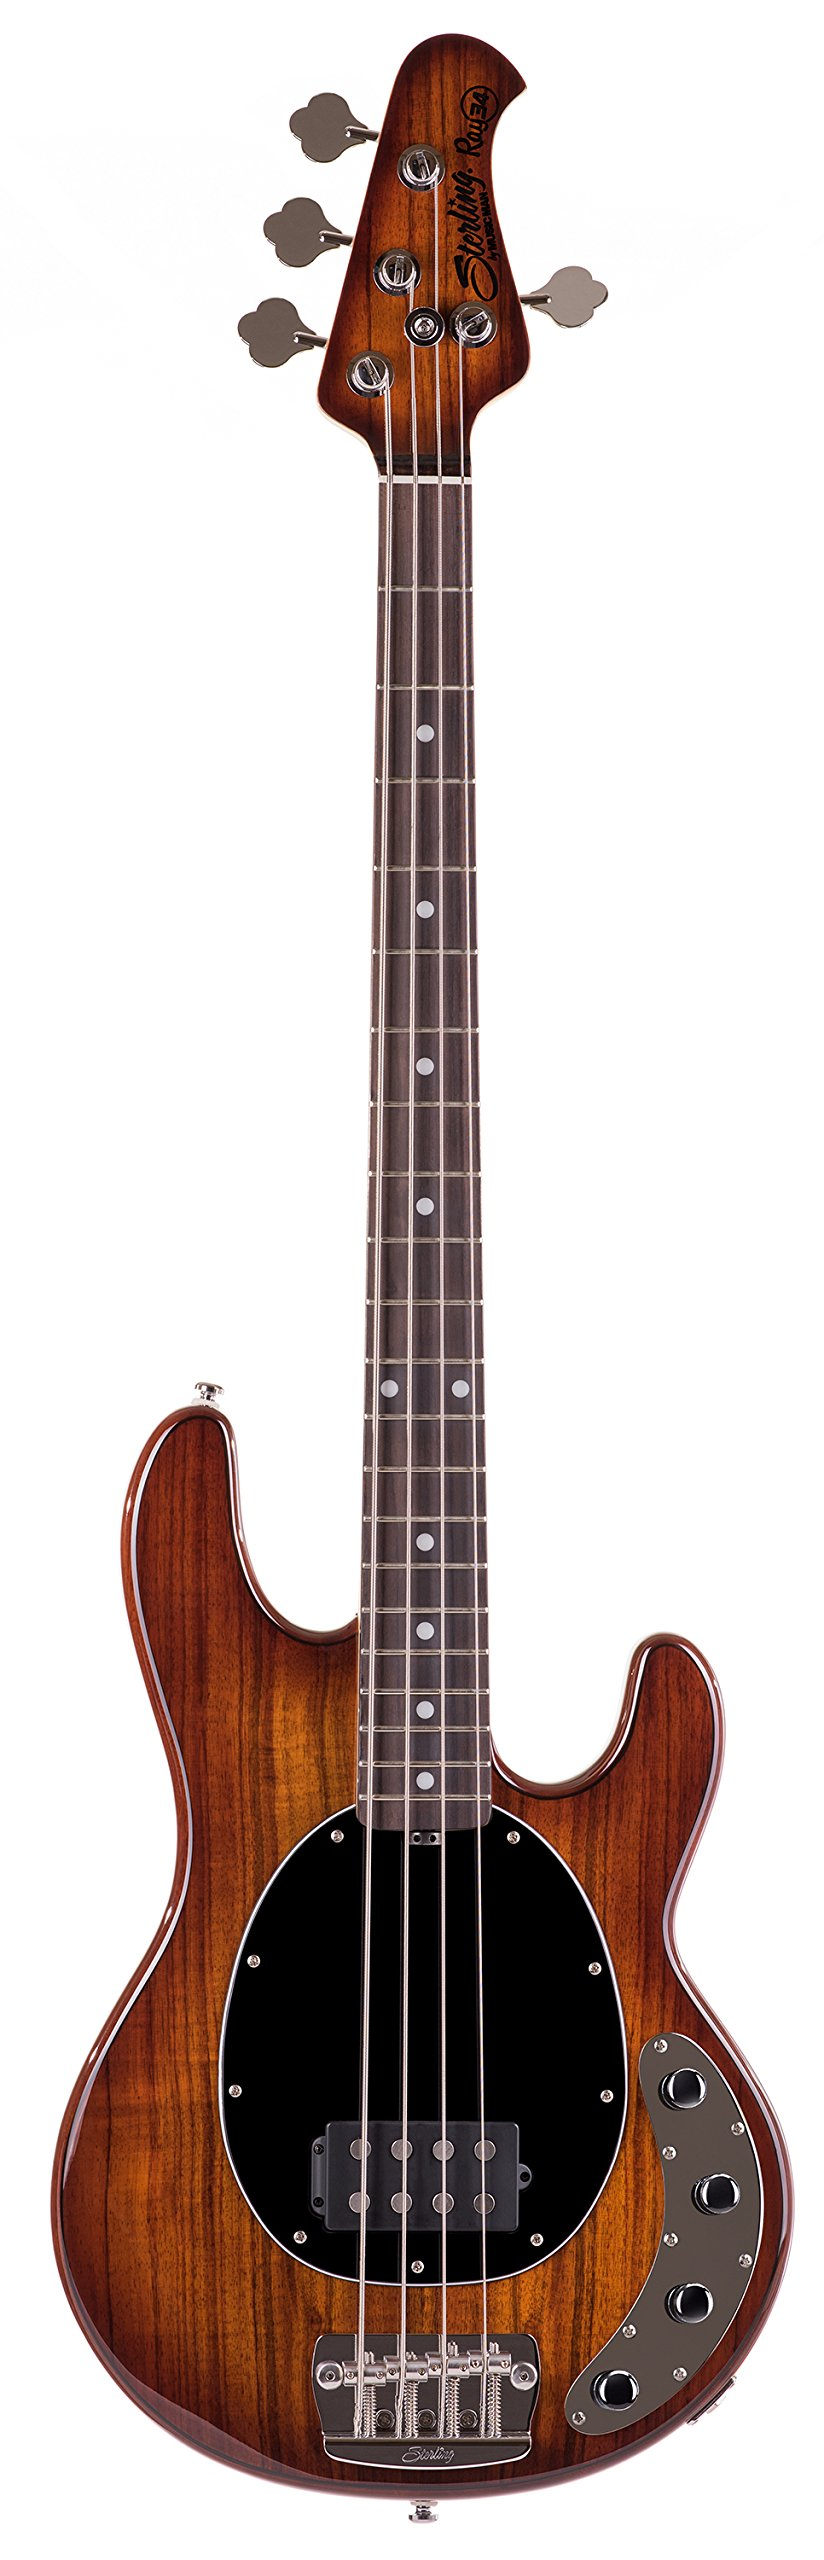 Sterling by Music Man Ray34 StingRay Bass, Koa Top